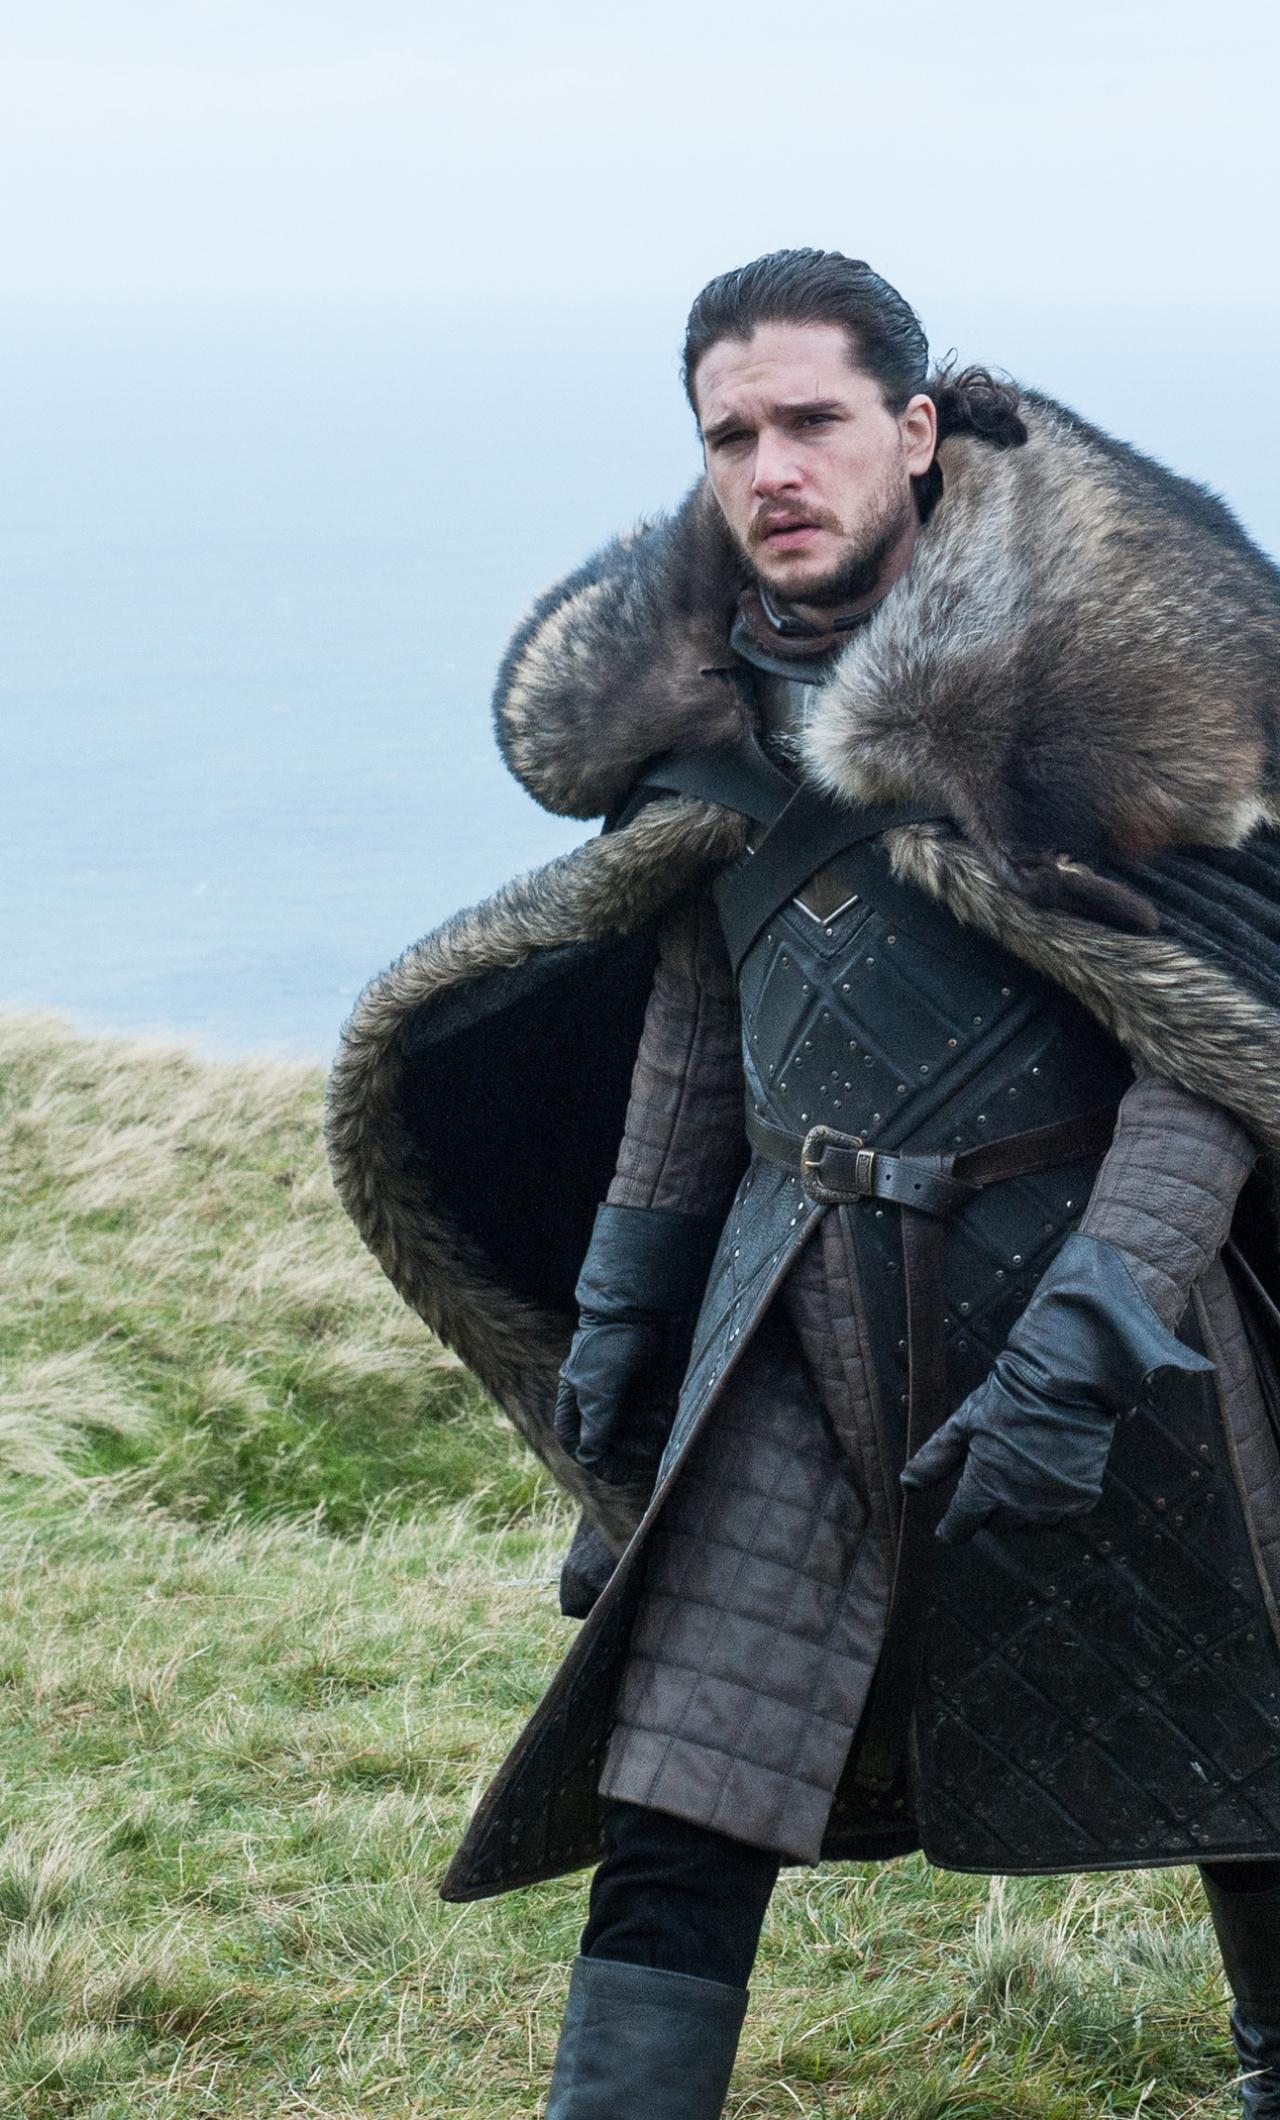 Jon Snow Game Of Thrones Season 7 Ep 5, HD 4K Wallpaper